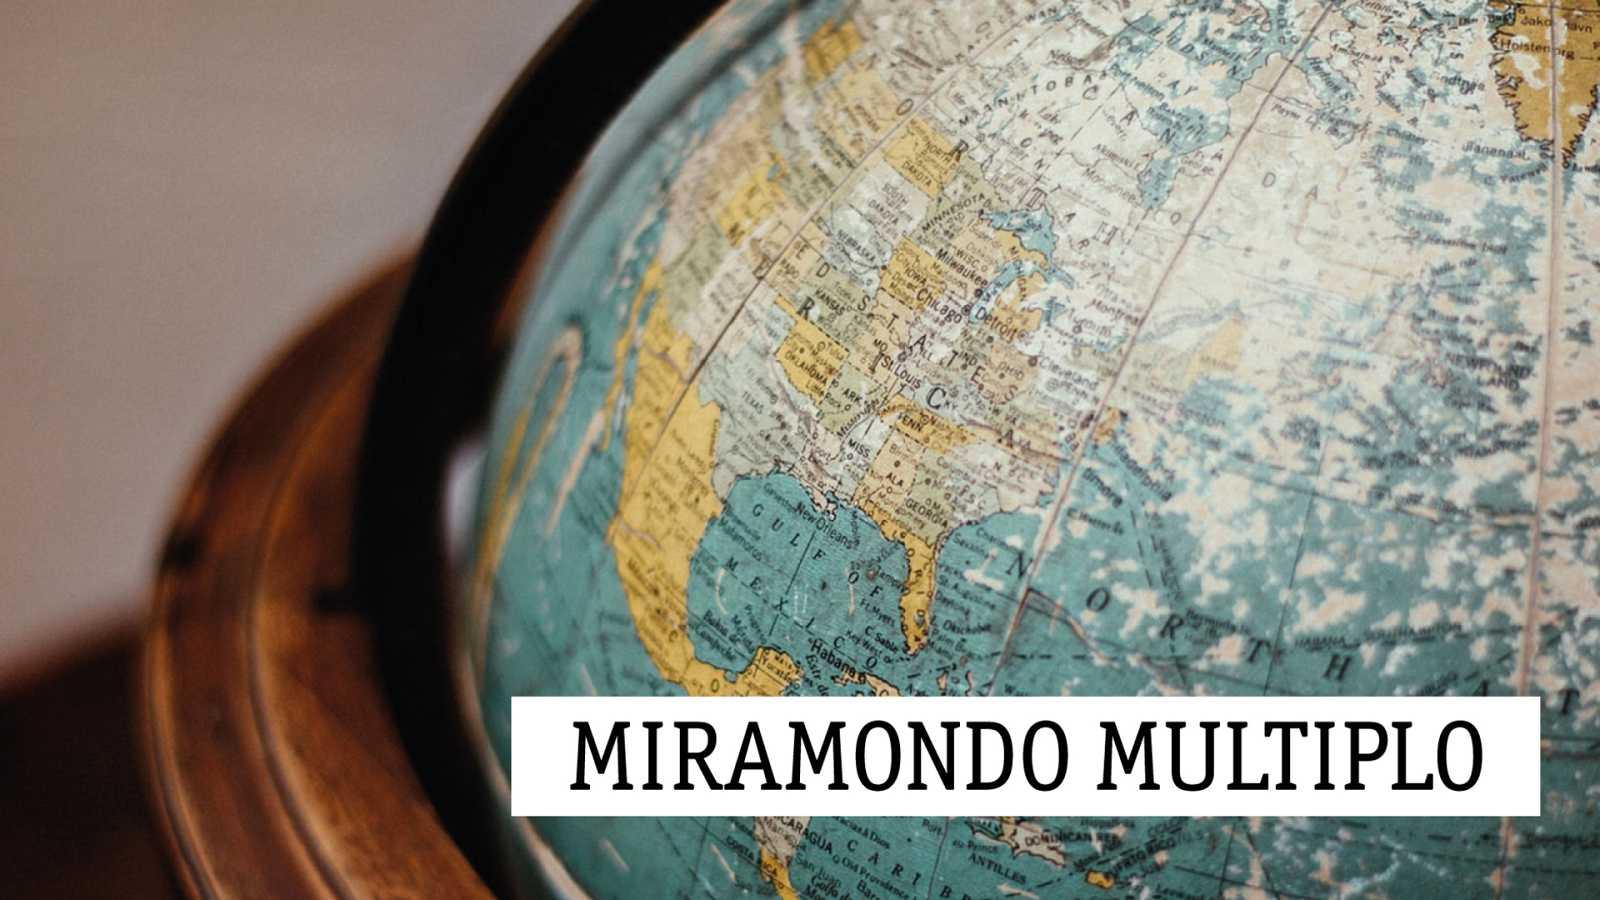 Miramondo múltiplo - Espejos I - 03/05/21  escuchar ahora